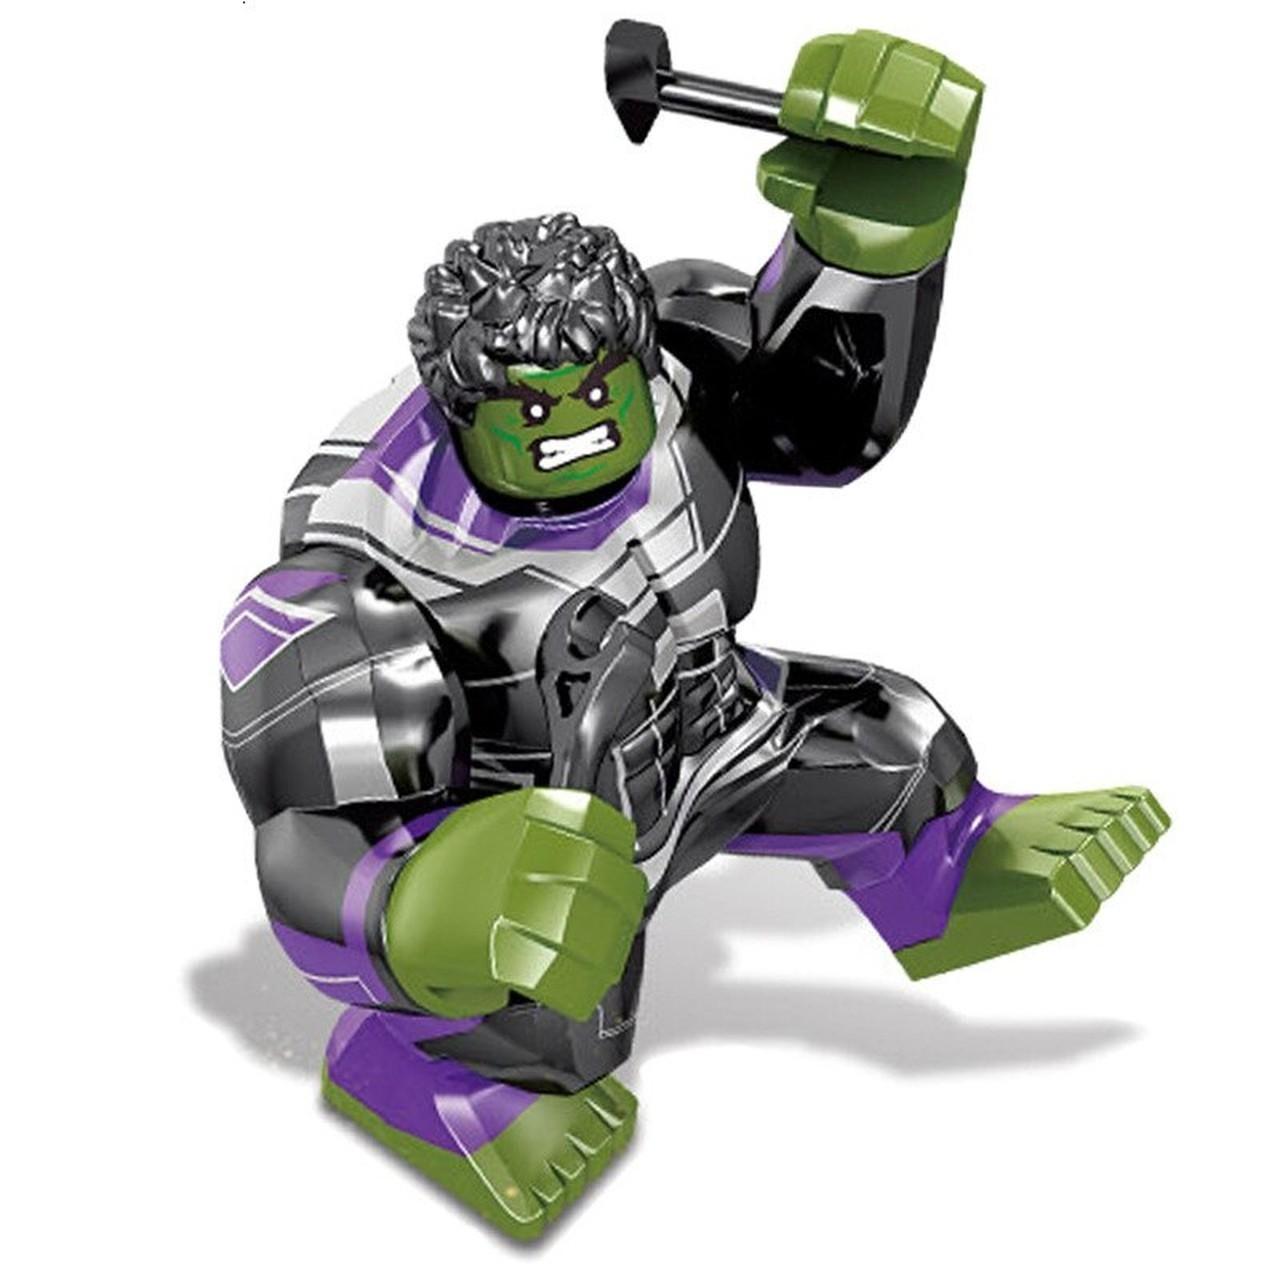 Bloco de Montar Hulk: Vingadores Ultimato (SY1311-8) - (16 Peças)